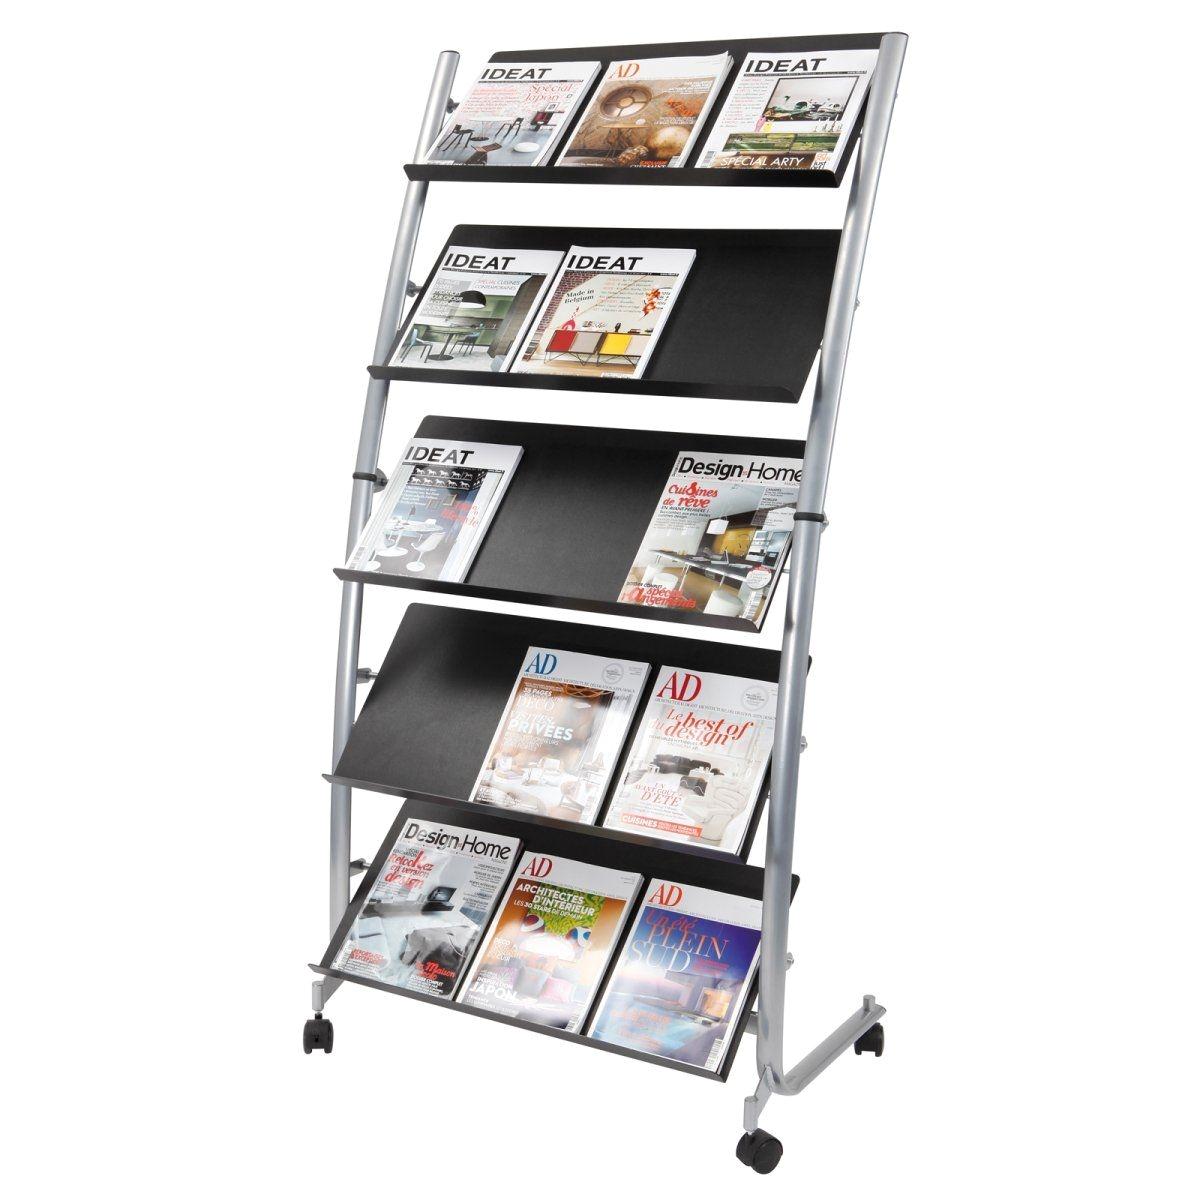 Poster Display Rack Alba Large Mobile Literature Display 5 Levels Work tools Pinterest